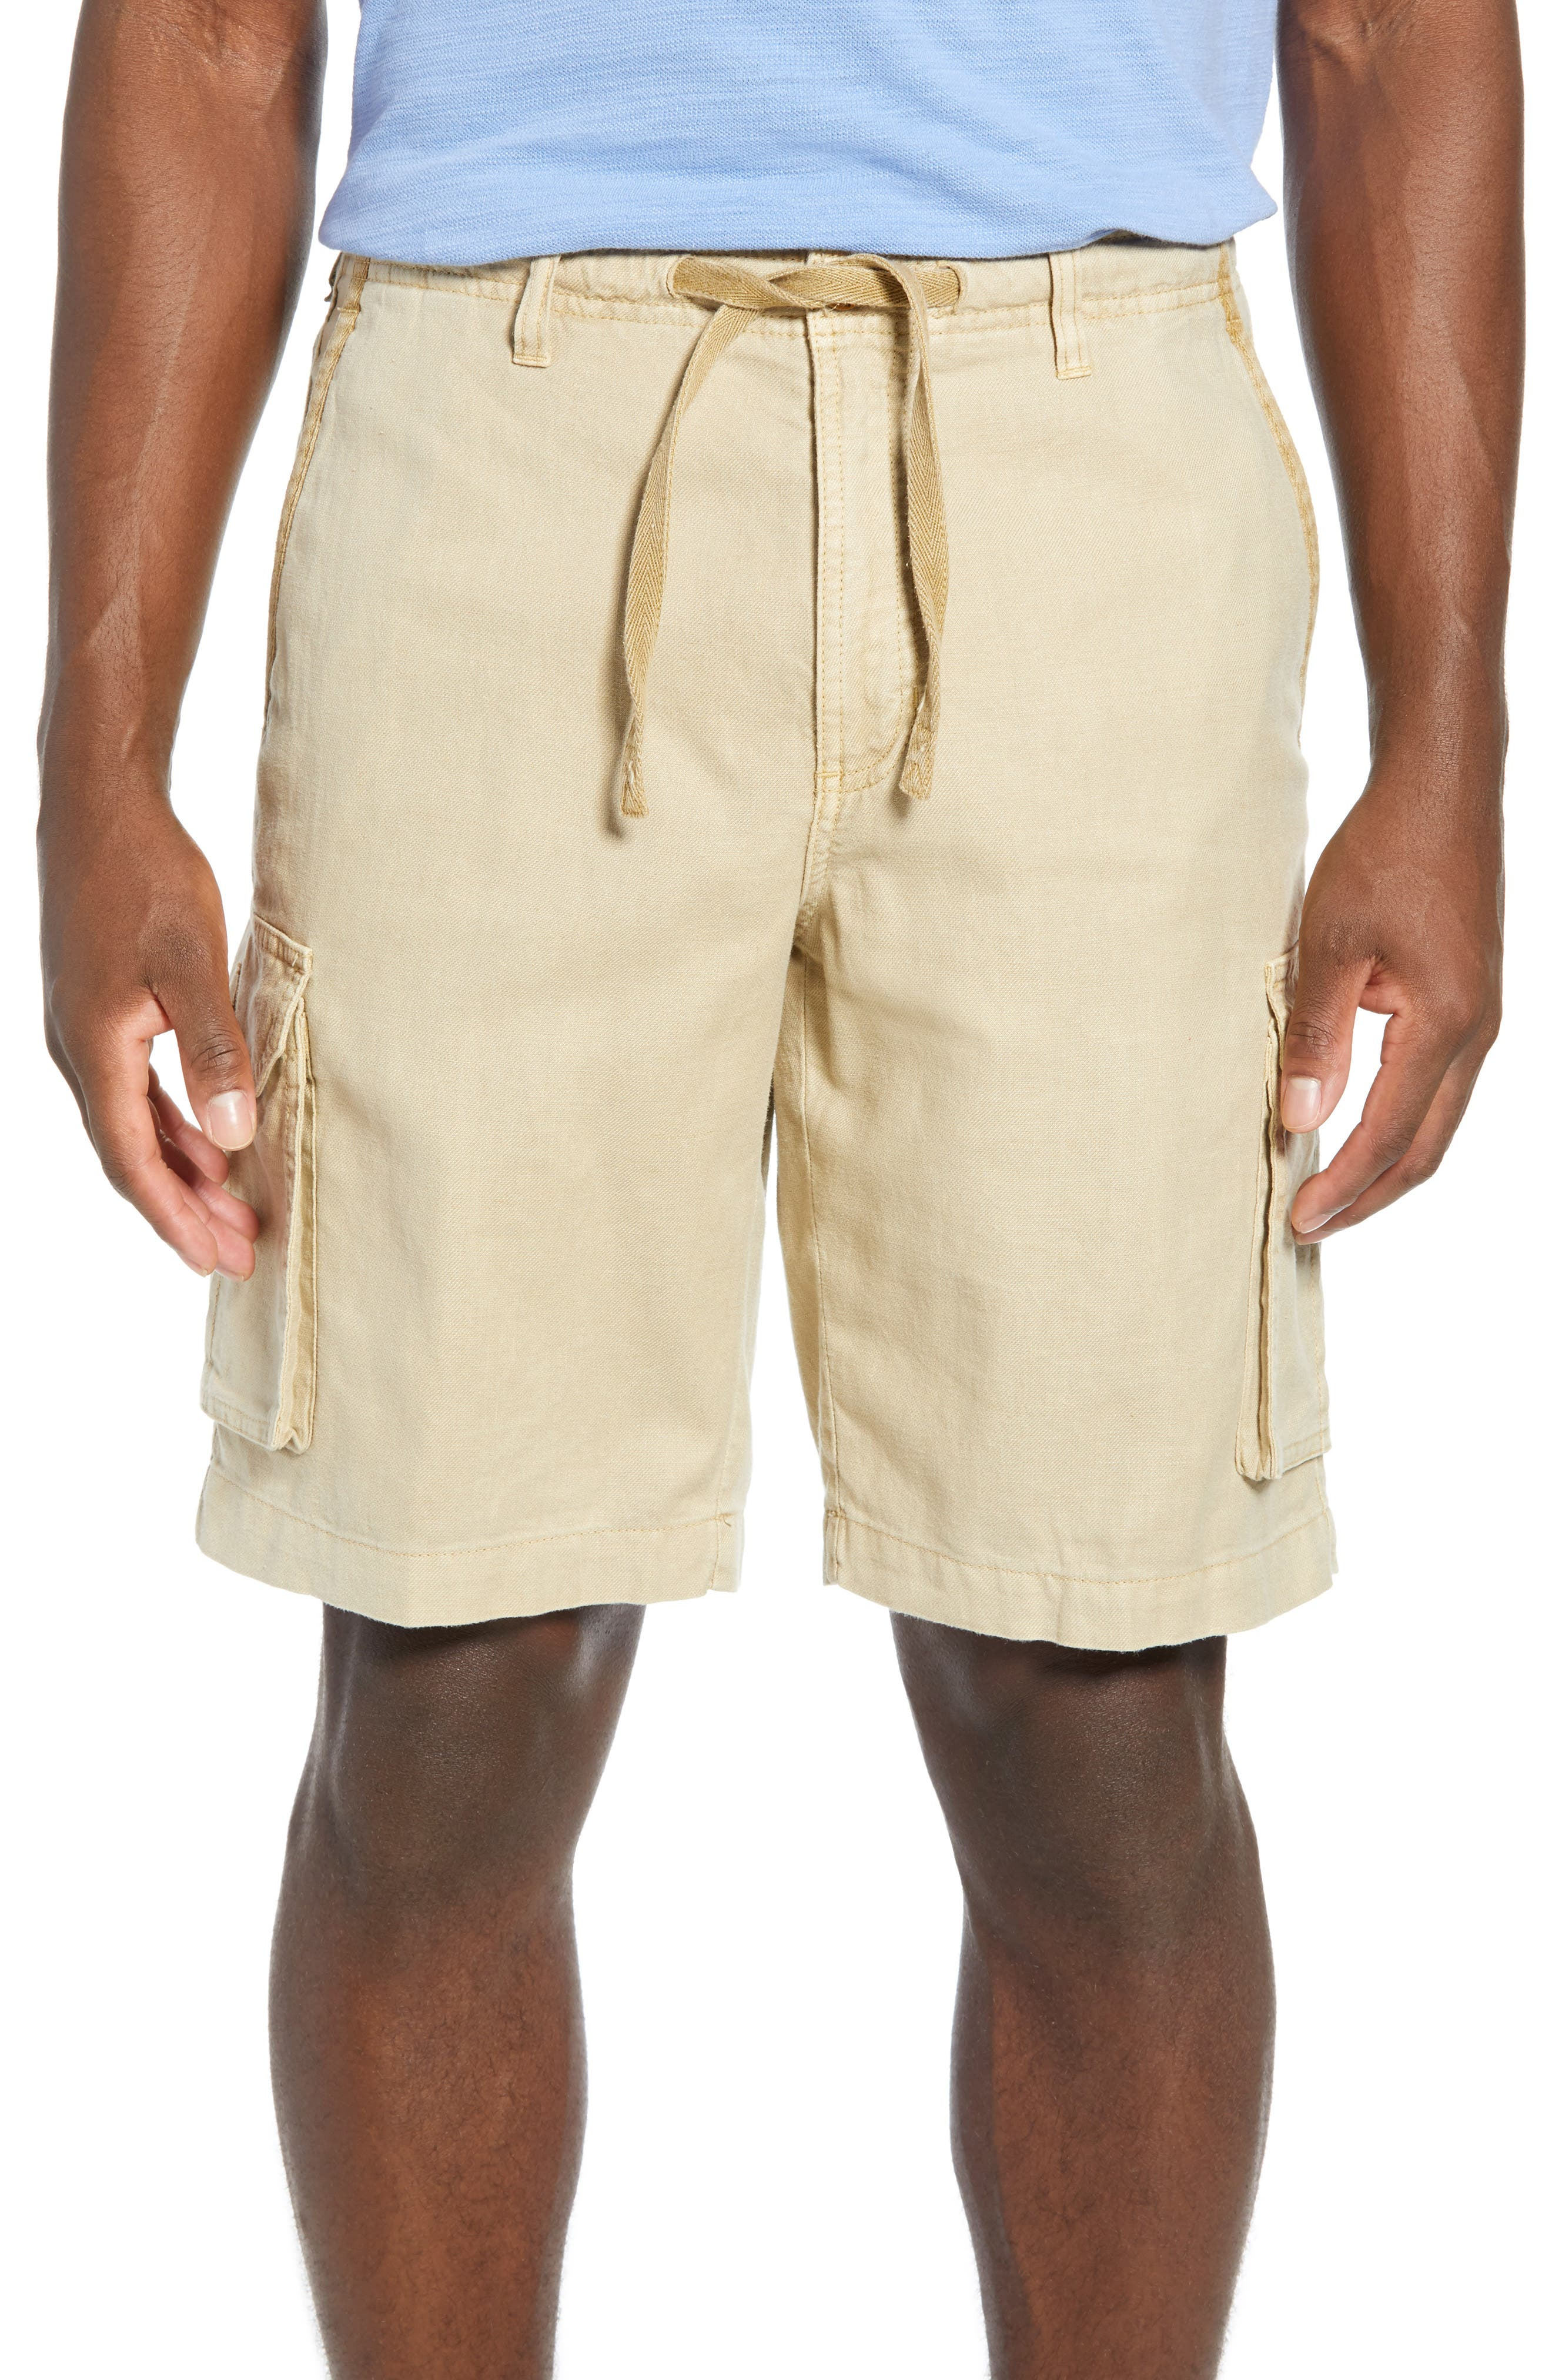 Tommy Bahama Soleil Beach Cargo Shorts, Brown